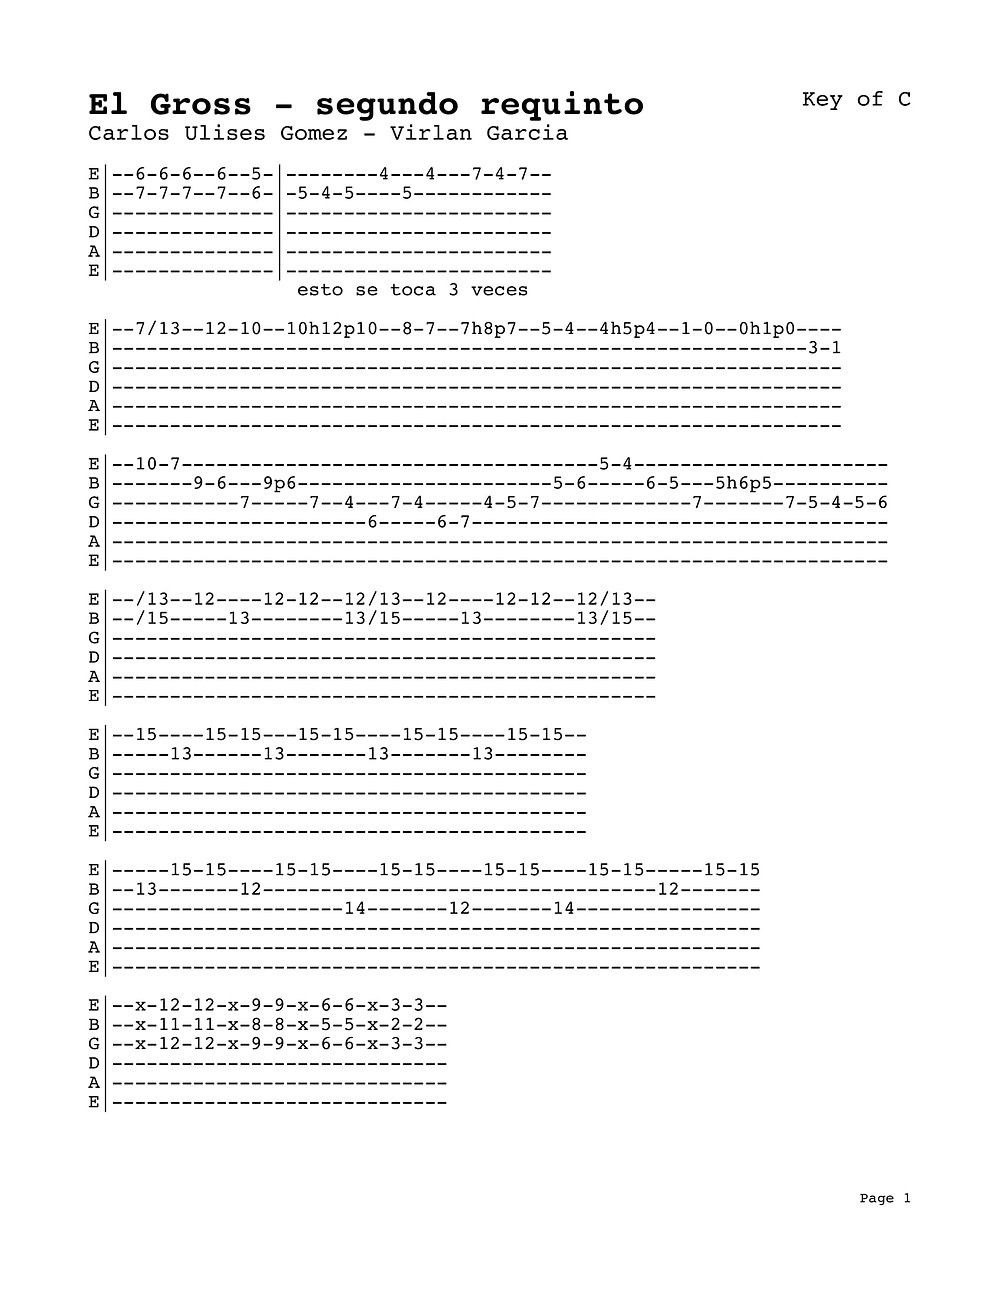 El Gross - CARLOS ULISES GOMEZ - Virlan Garcia - Tutorial - SEGUNDO REQUINTO - Acordeon - Guitarra -